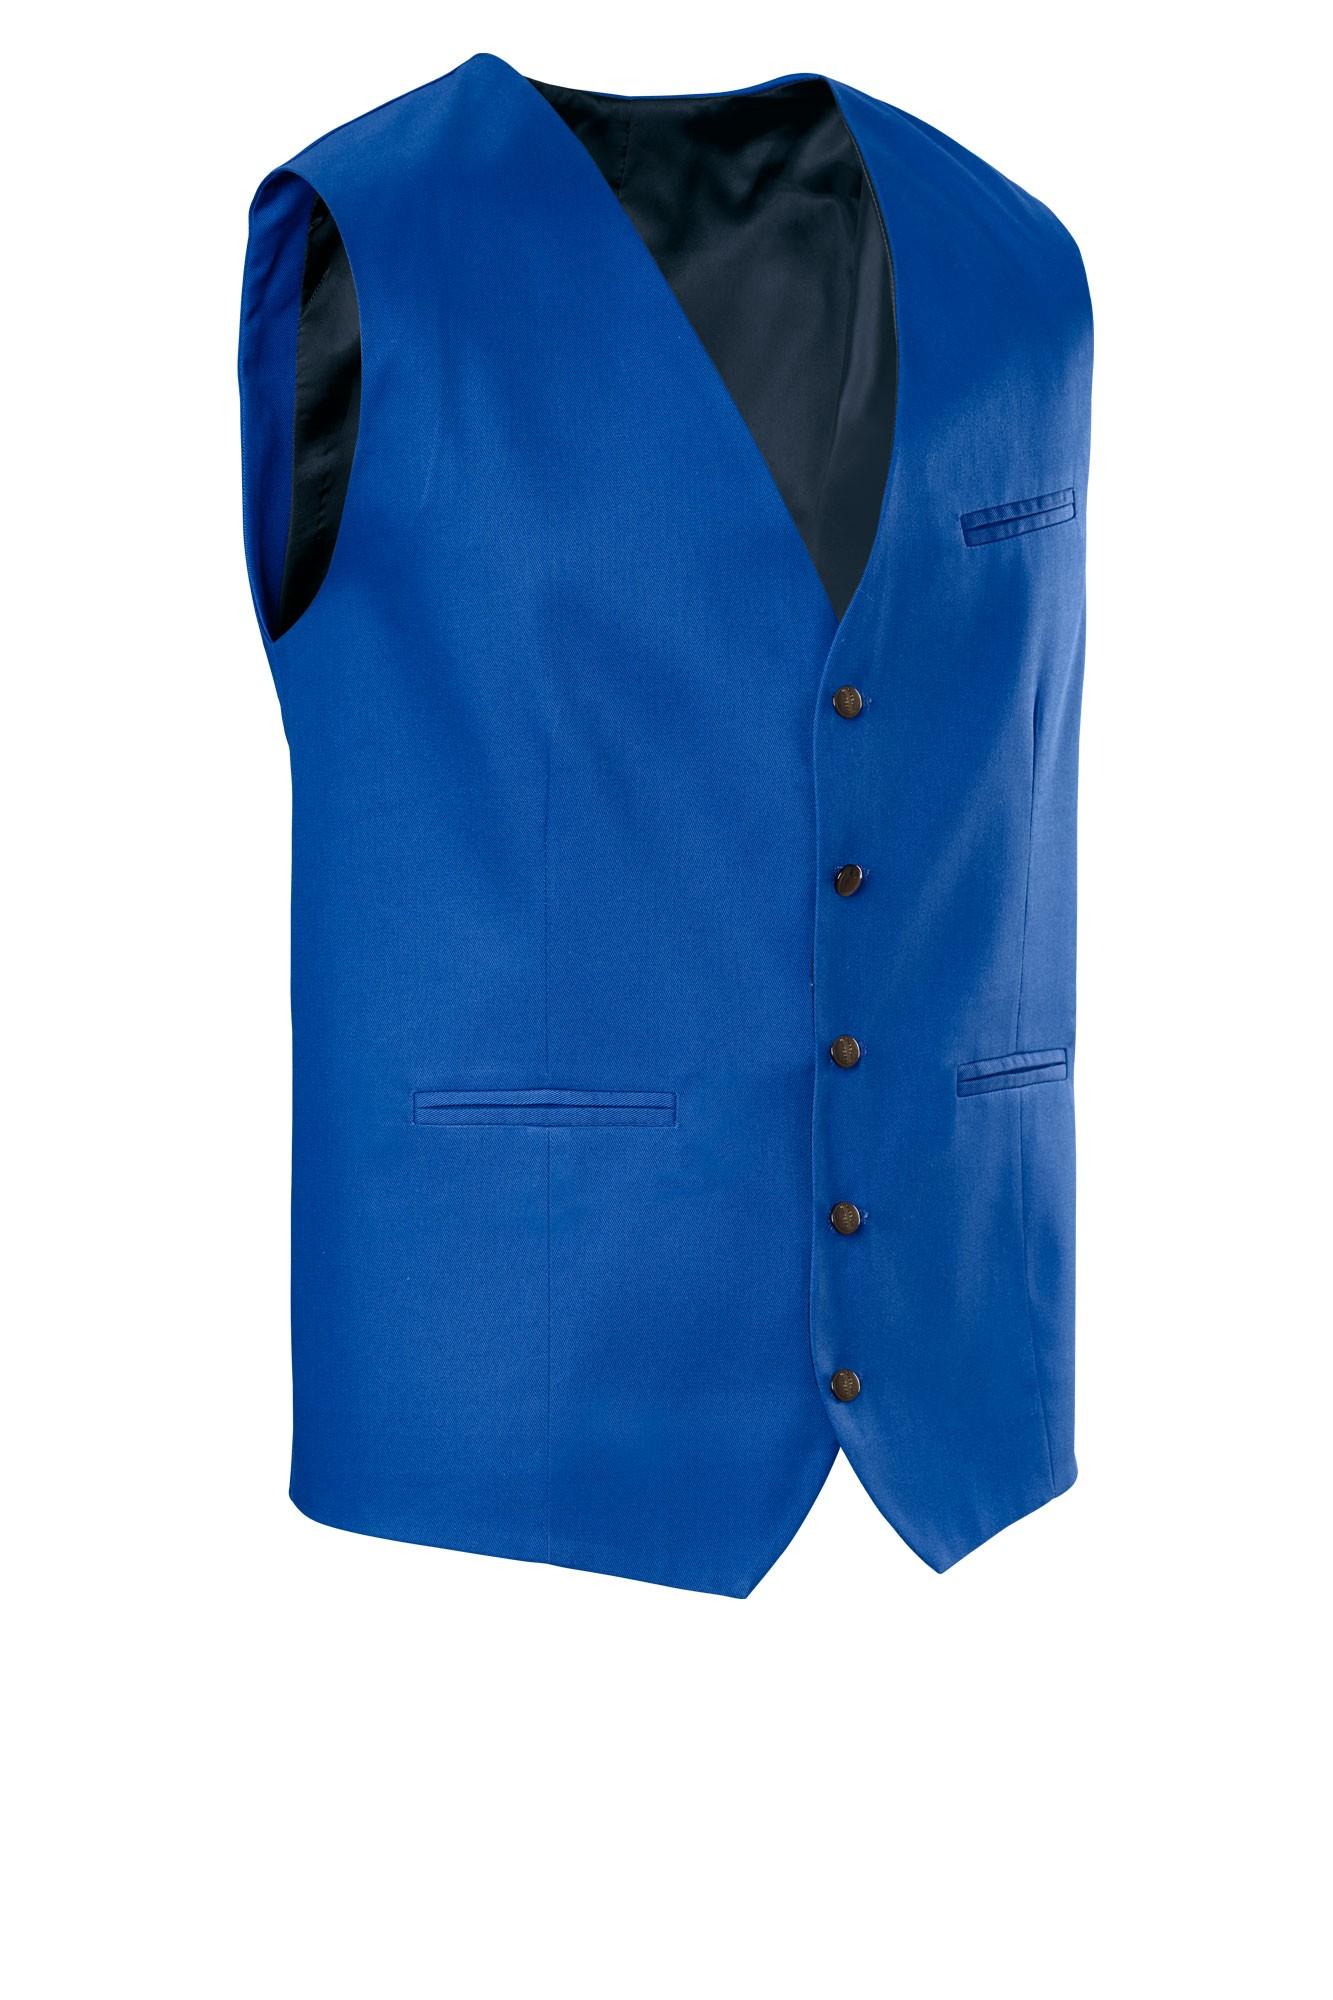 Pánská vesta Bistro - modrá